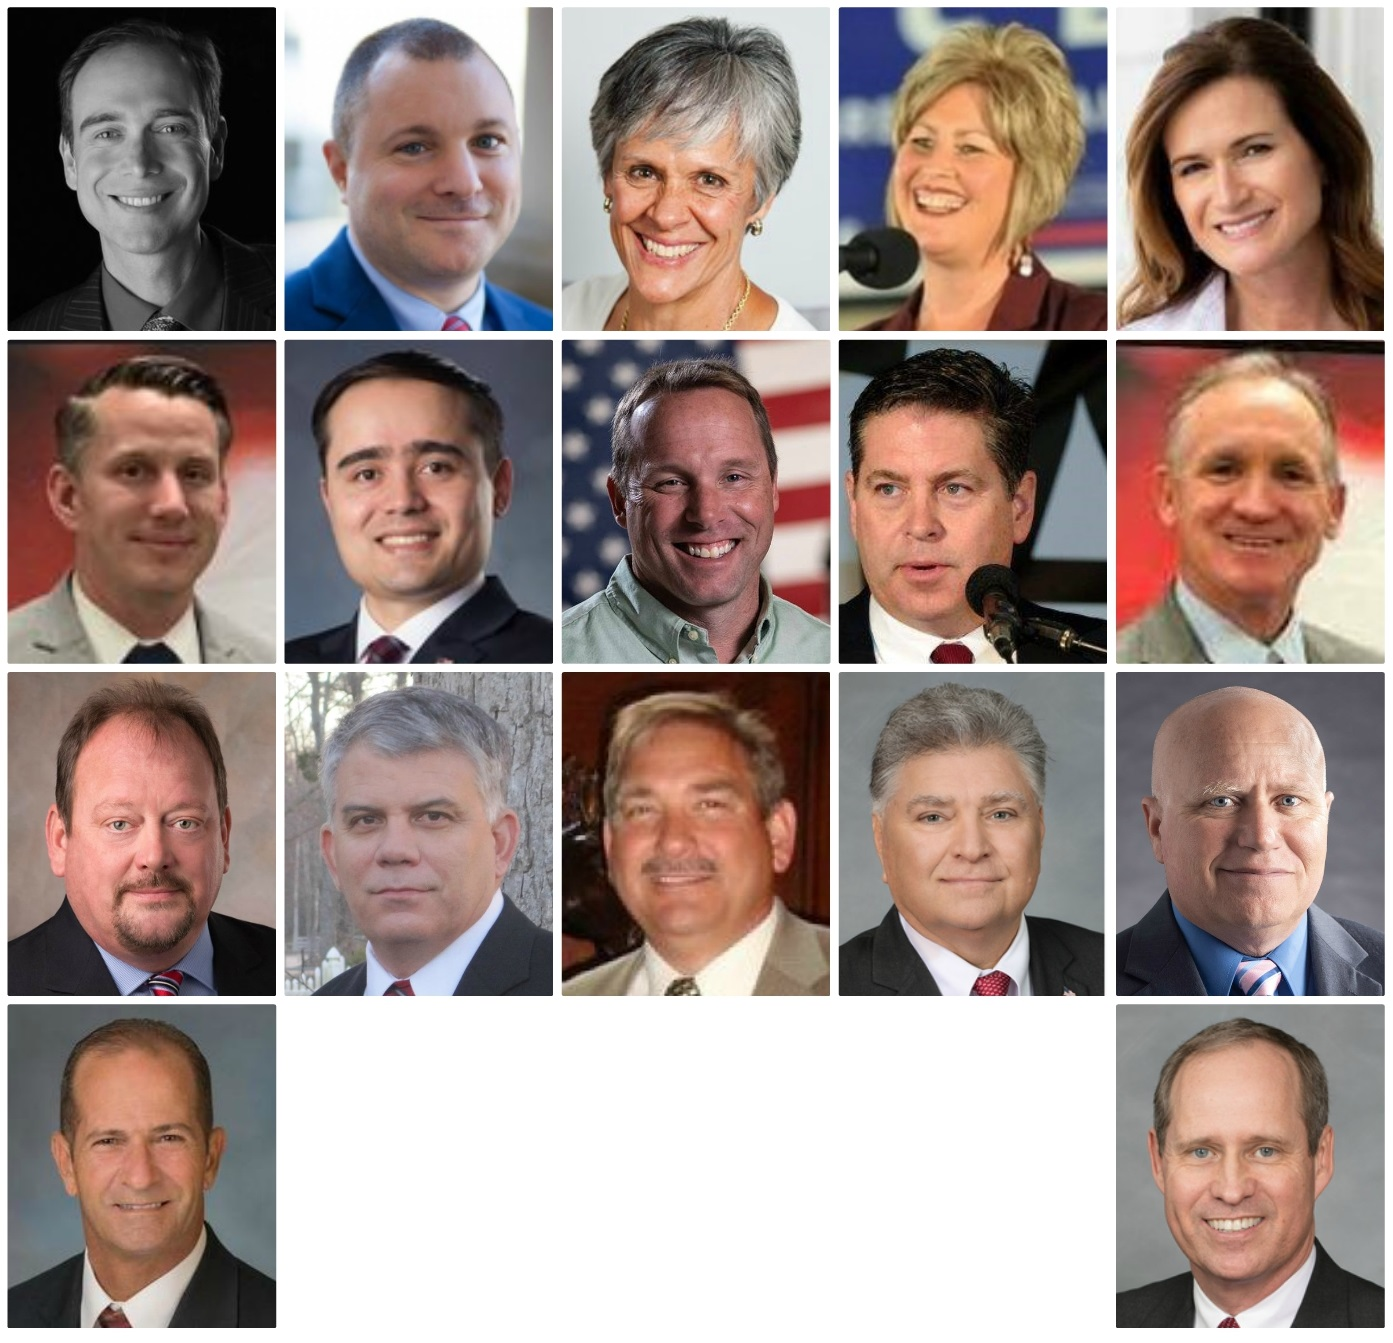 RepublicanCandidates for N.C. Congressional District 3